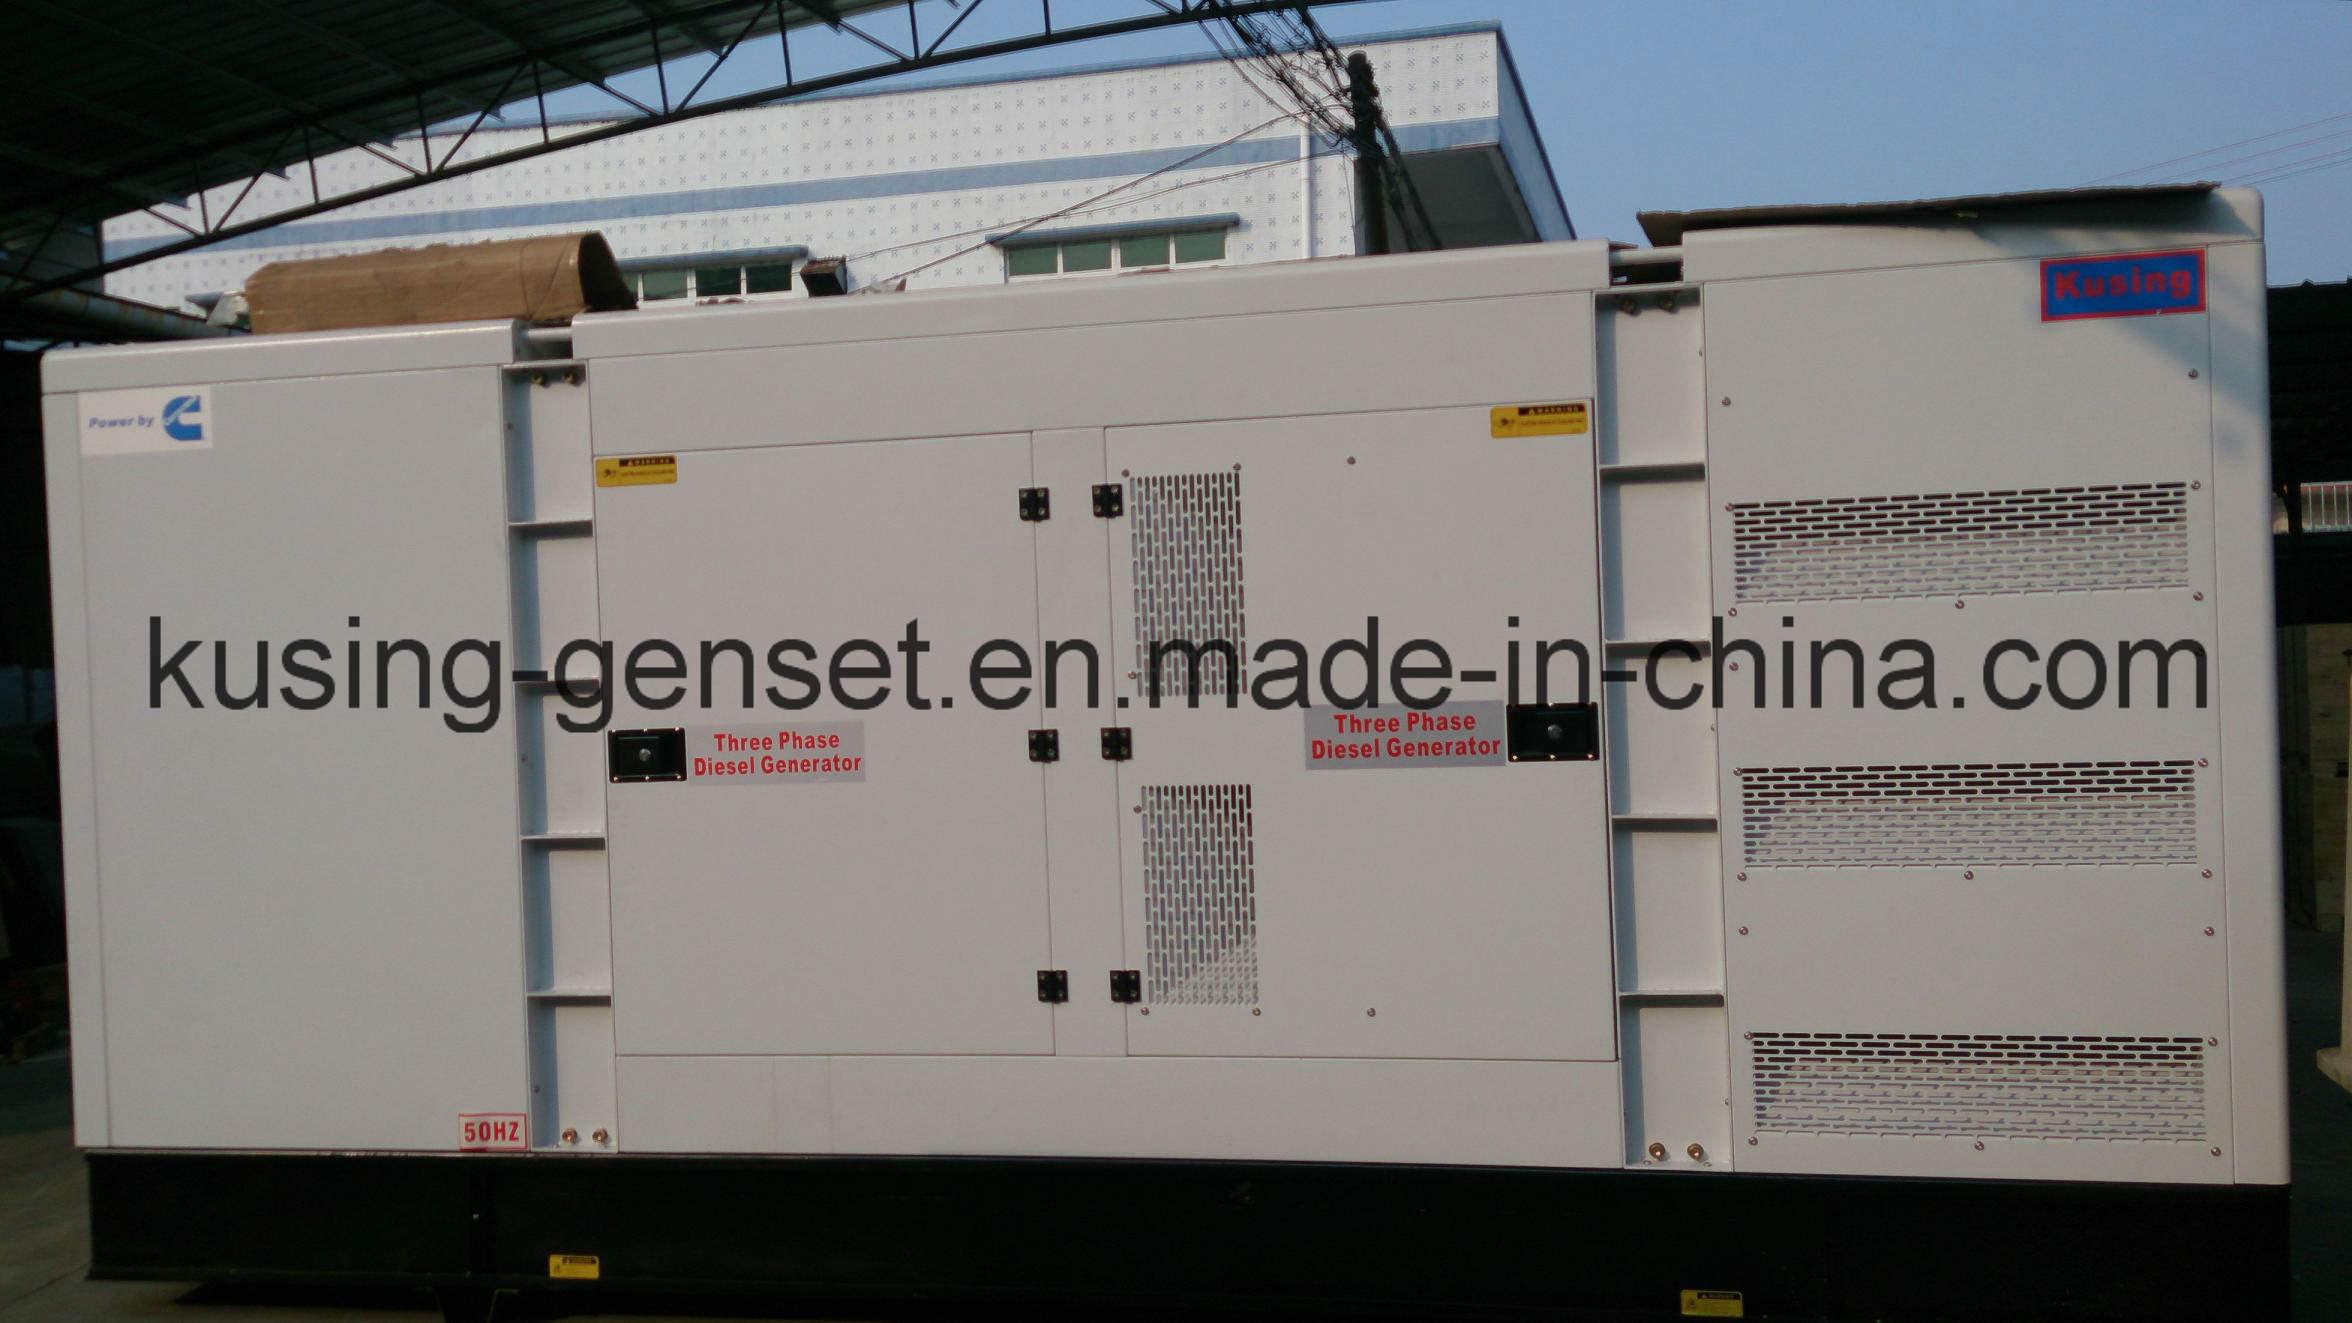 30kVA-2250kVA Diesel Silent Generator with Cummins Engine (CK33600)